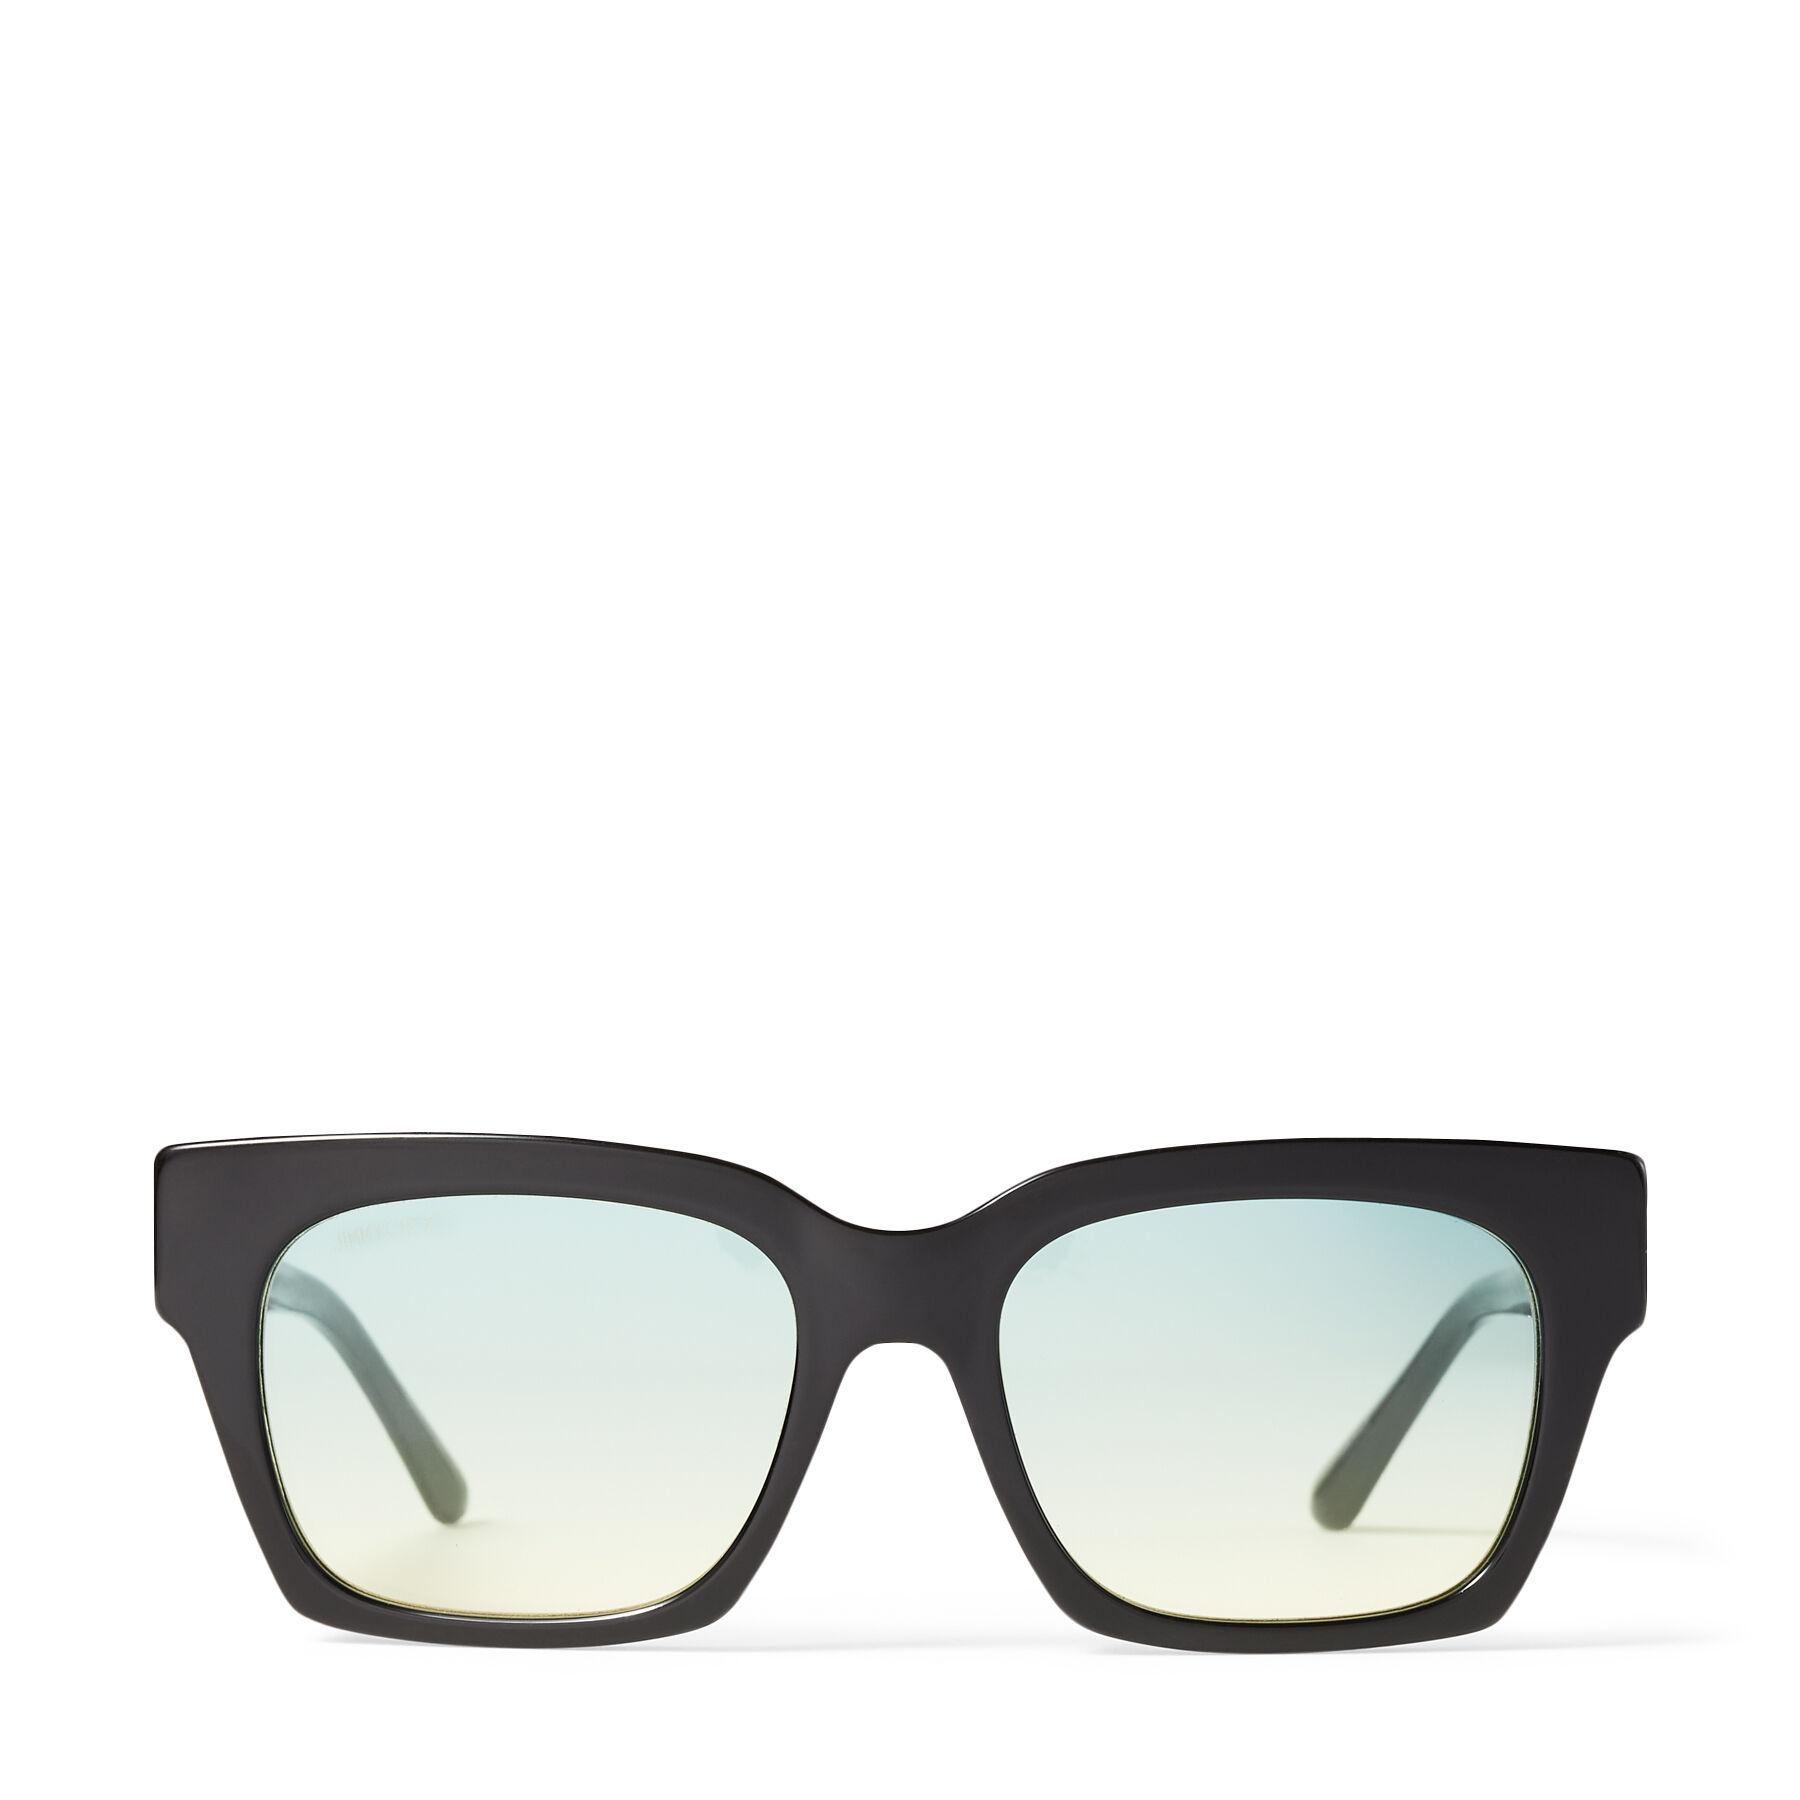 JO - Black Acetate Square-Eye Sunglasses with Gold JC Logo